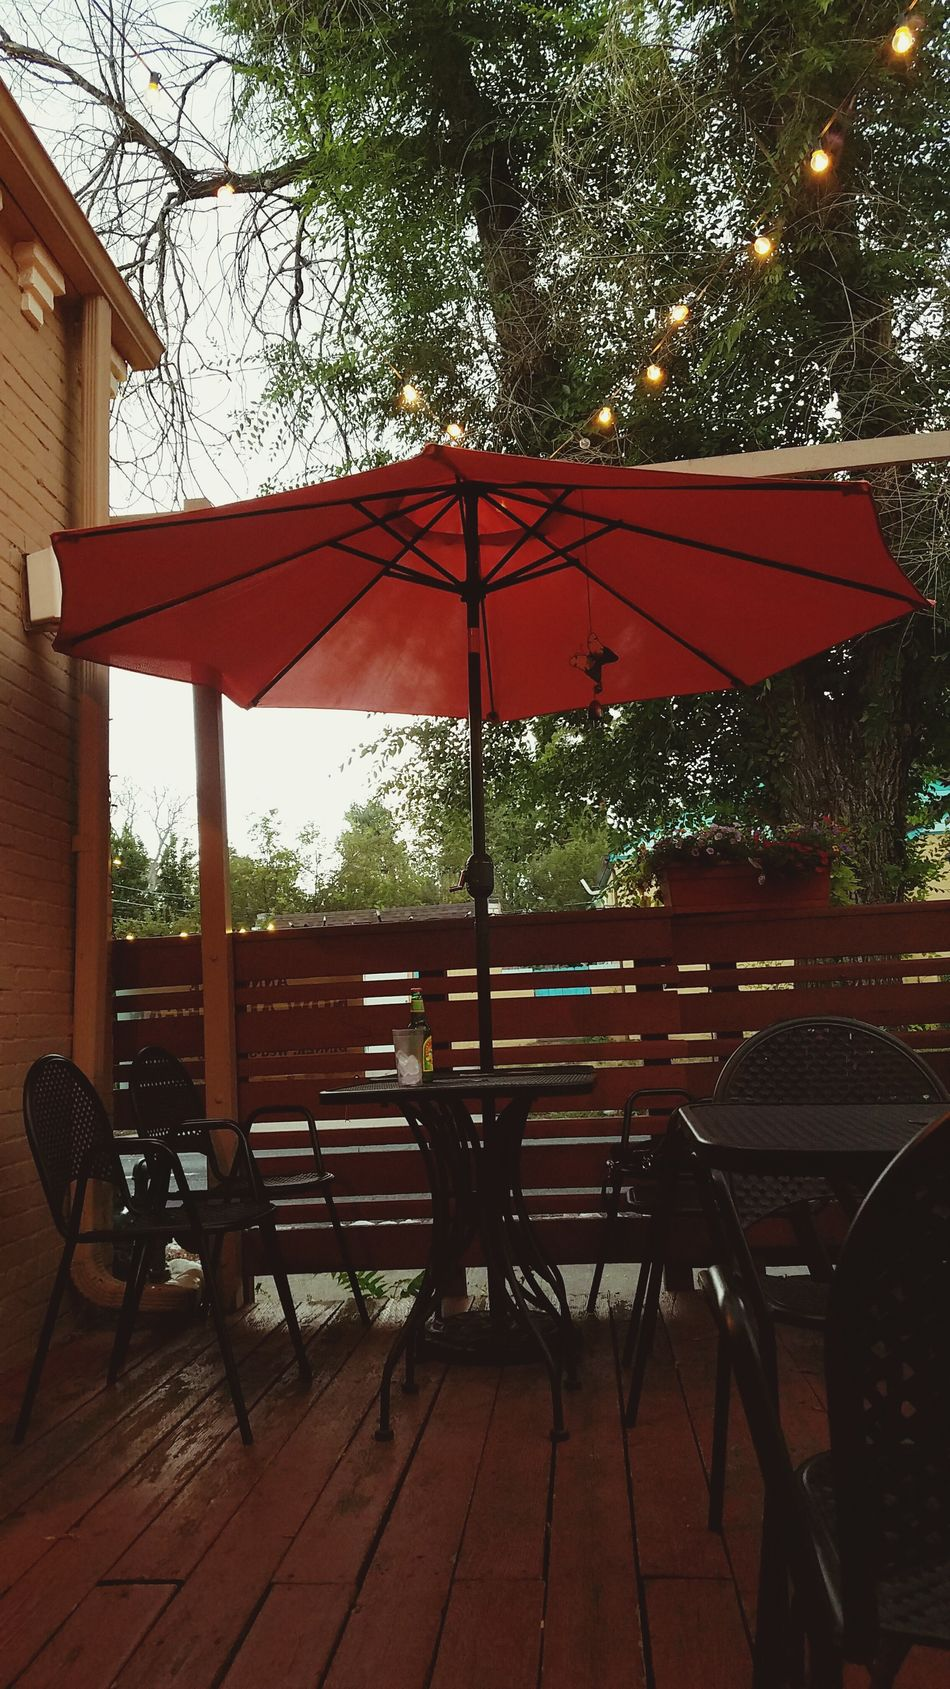 Tree Chair No People Outdoors Day Nature Sky Table Lights Summer Porch Orange Orange Umbrella Restaurant Outdoor Restaurant